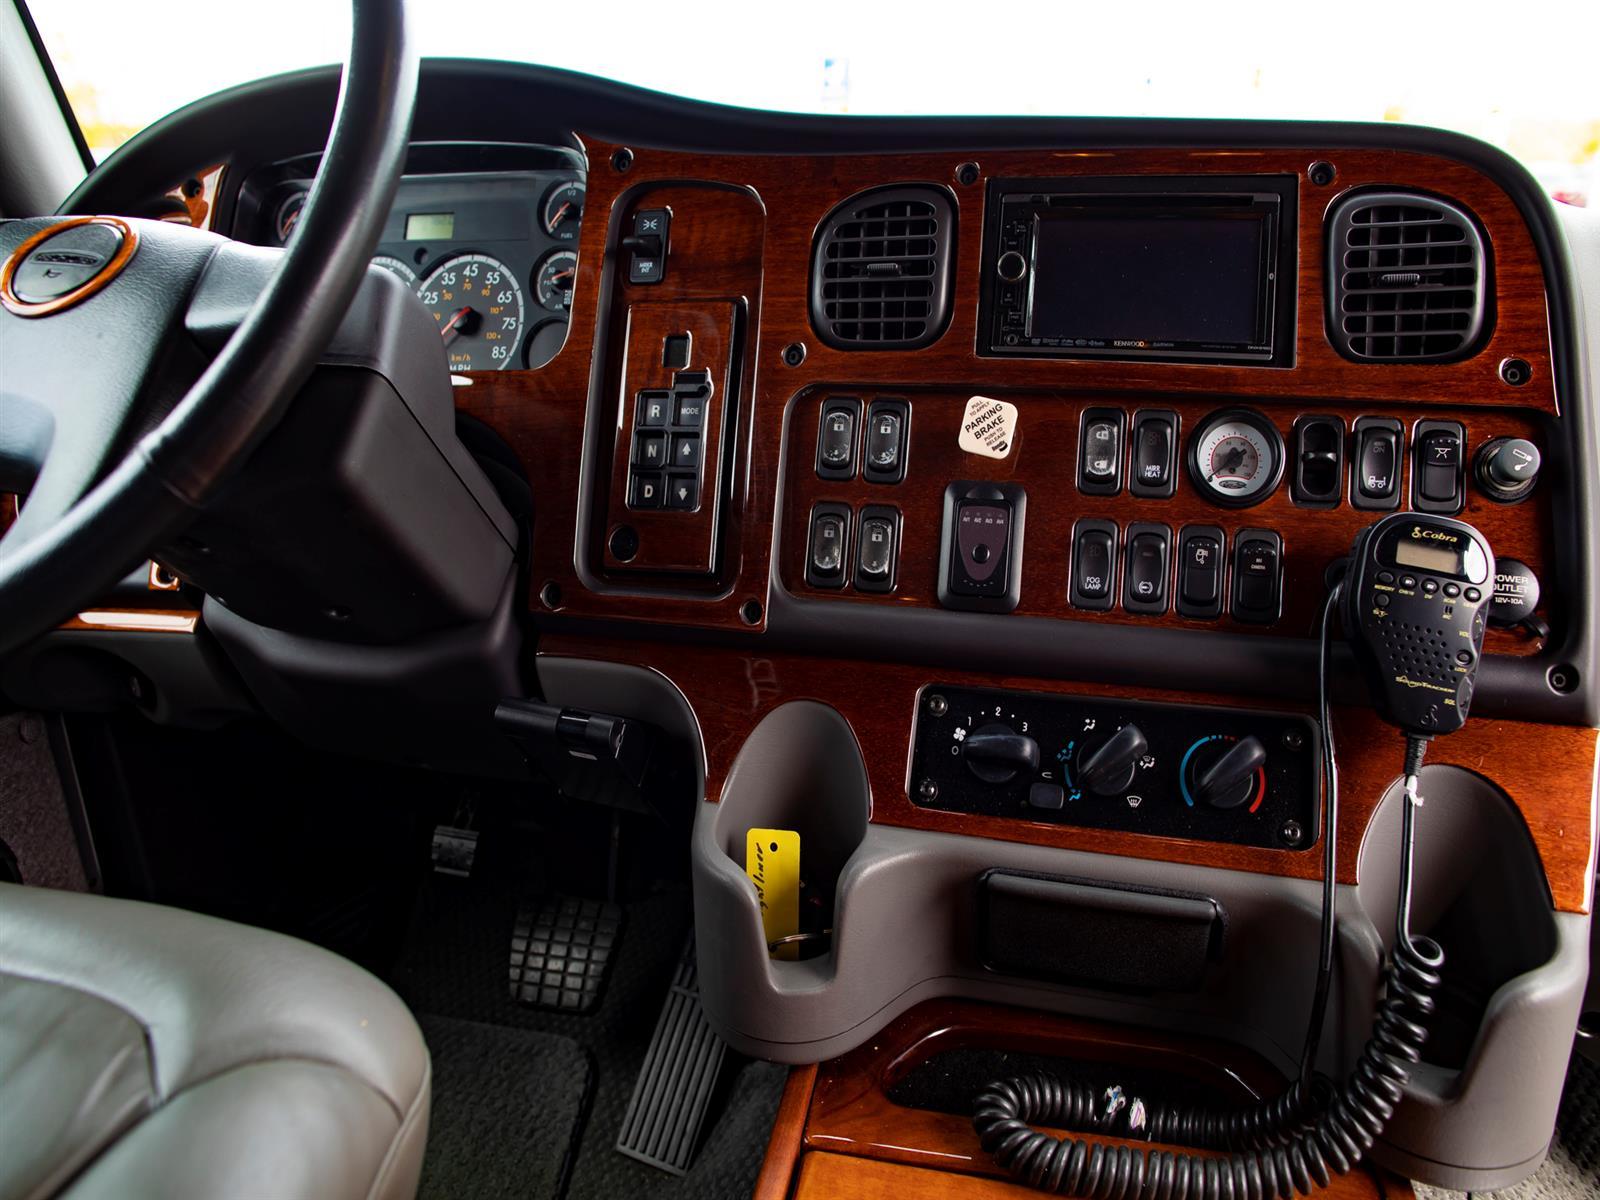 2005 Freightliner M2 Sport MS 106